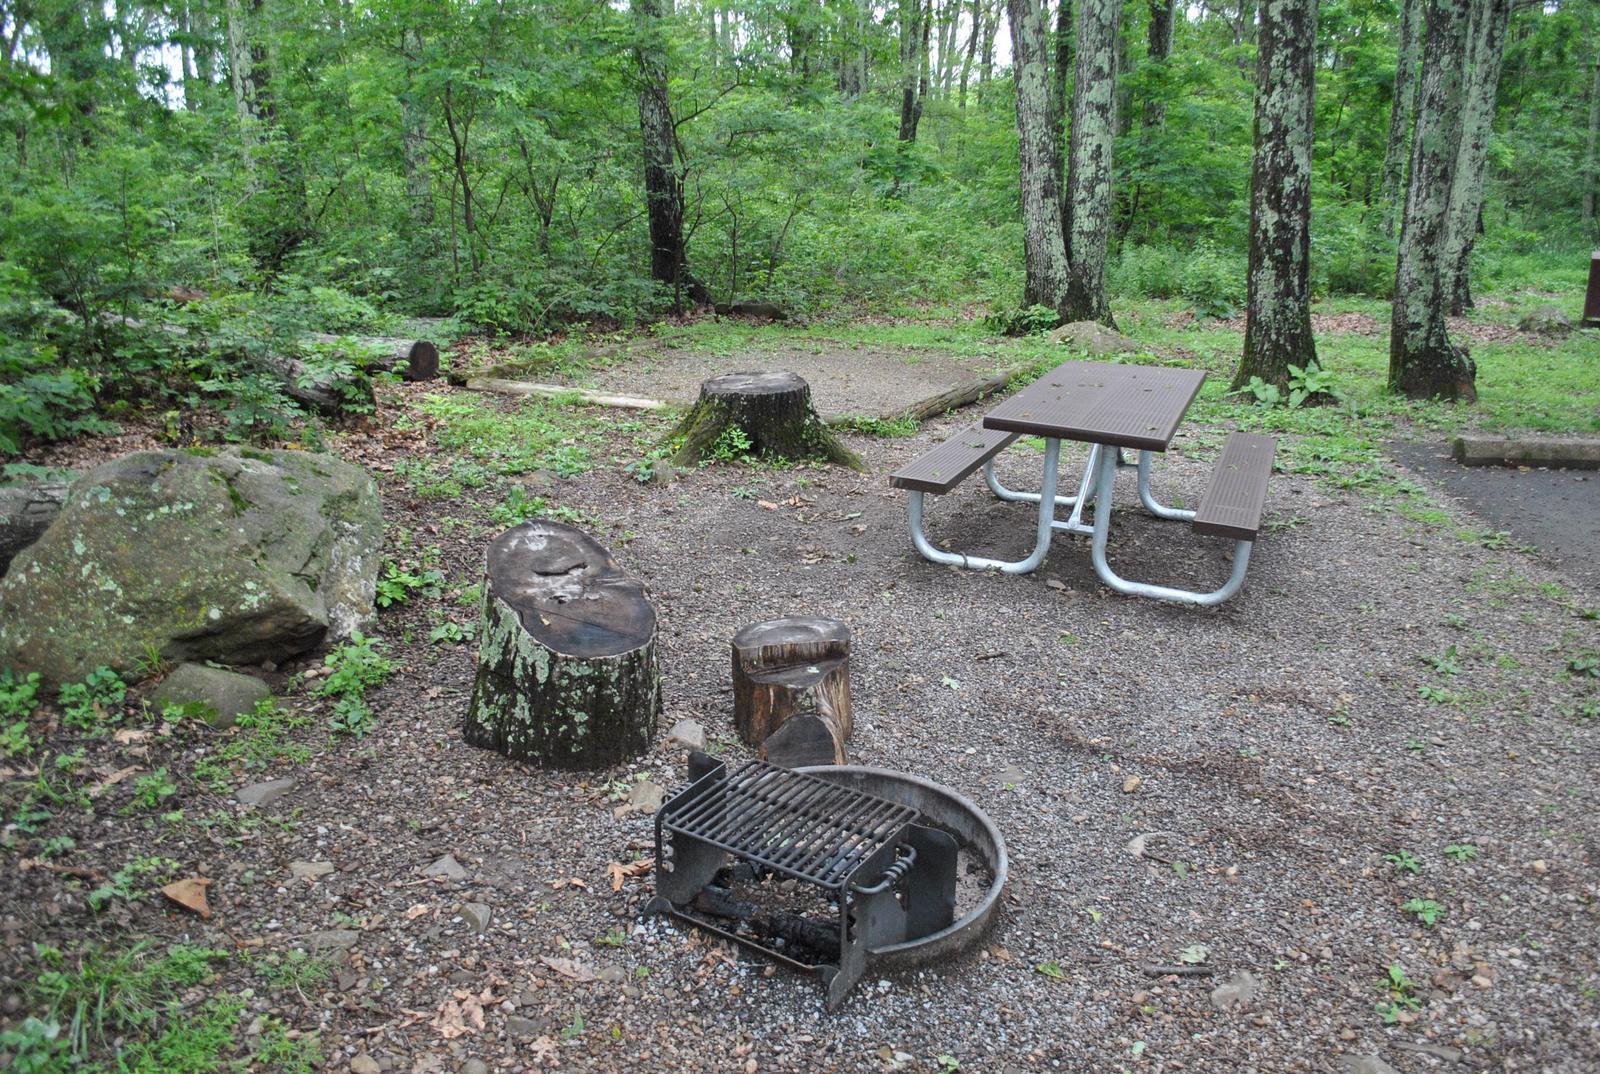 Mathews Arm Campground – Site A062